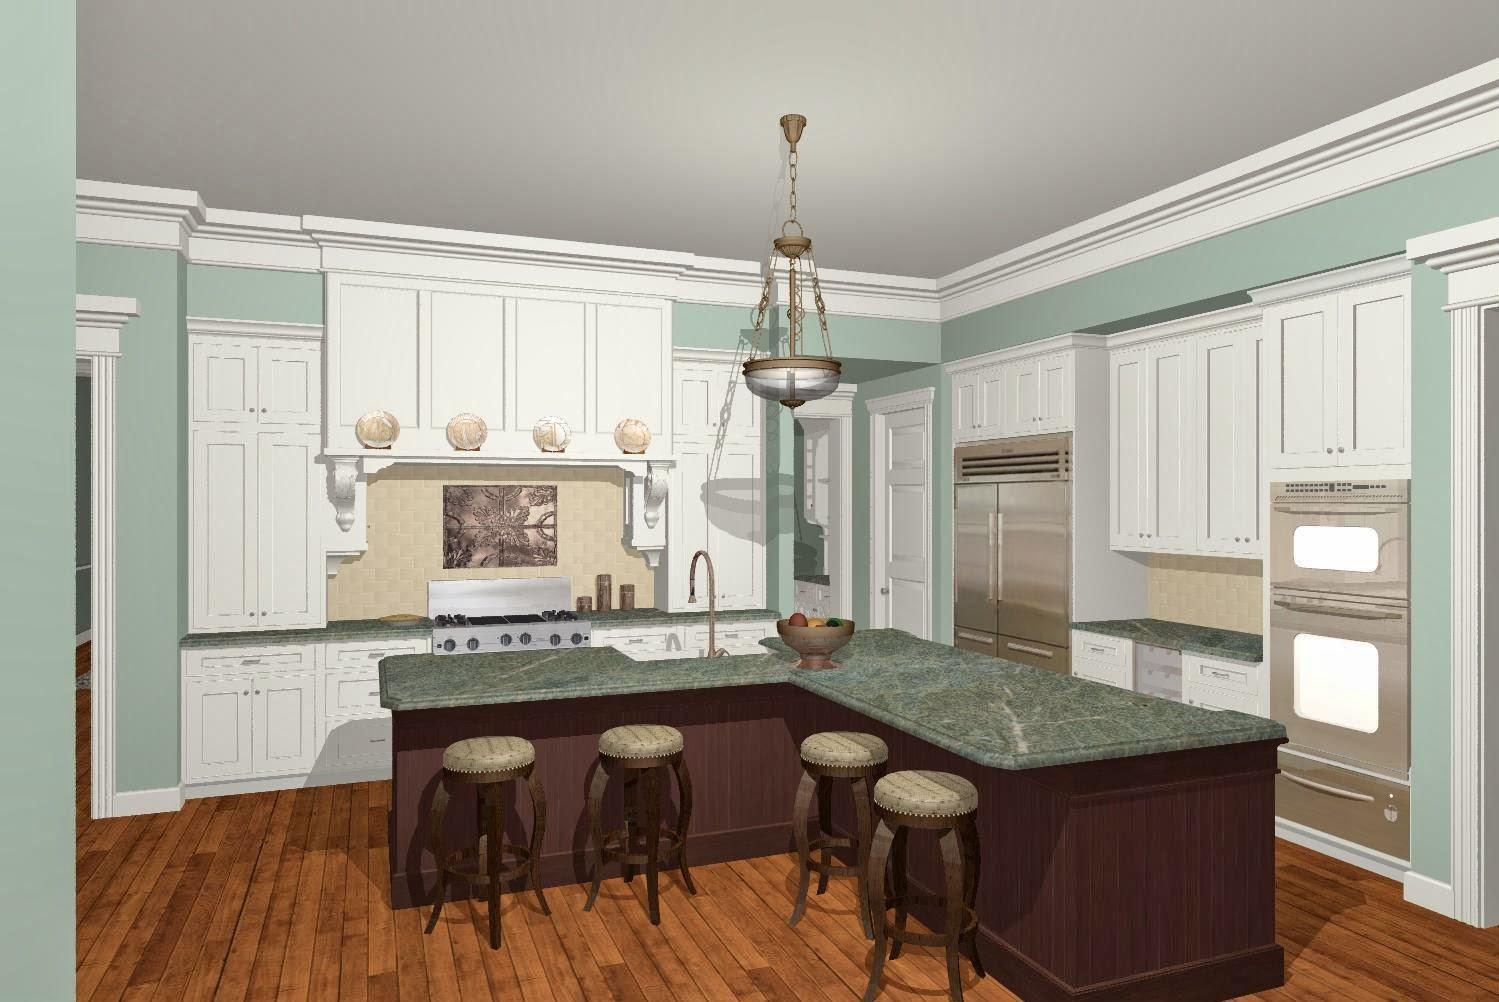 latest pictures modern home decoration interior design ideas small kitchen island ideas space part kitchen